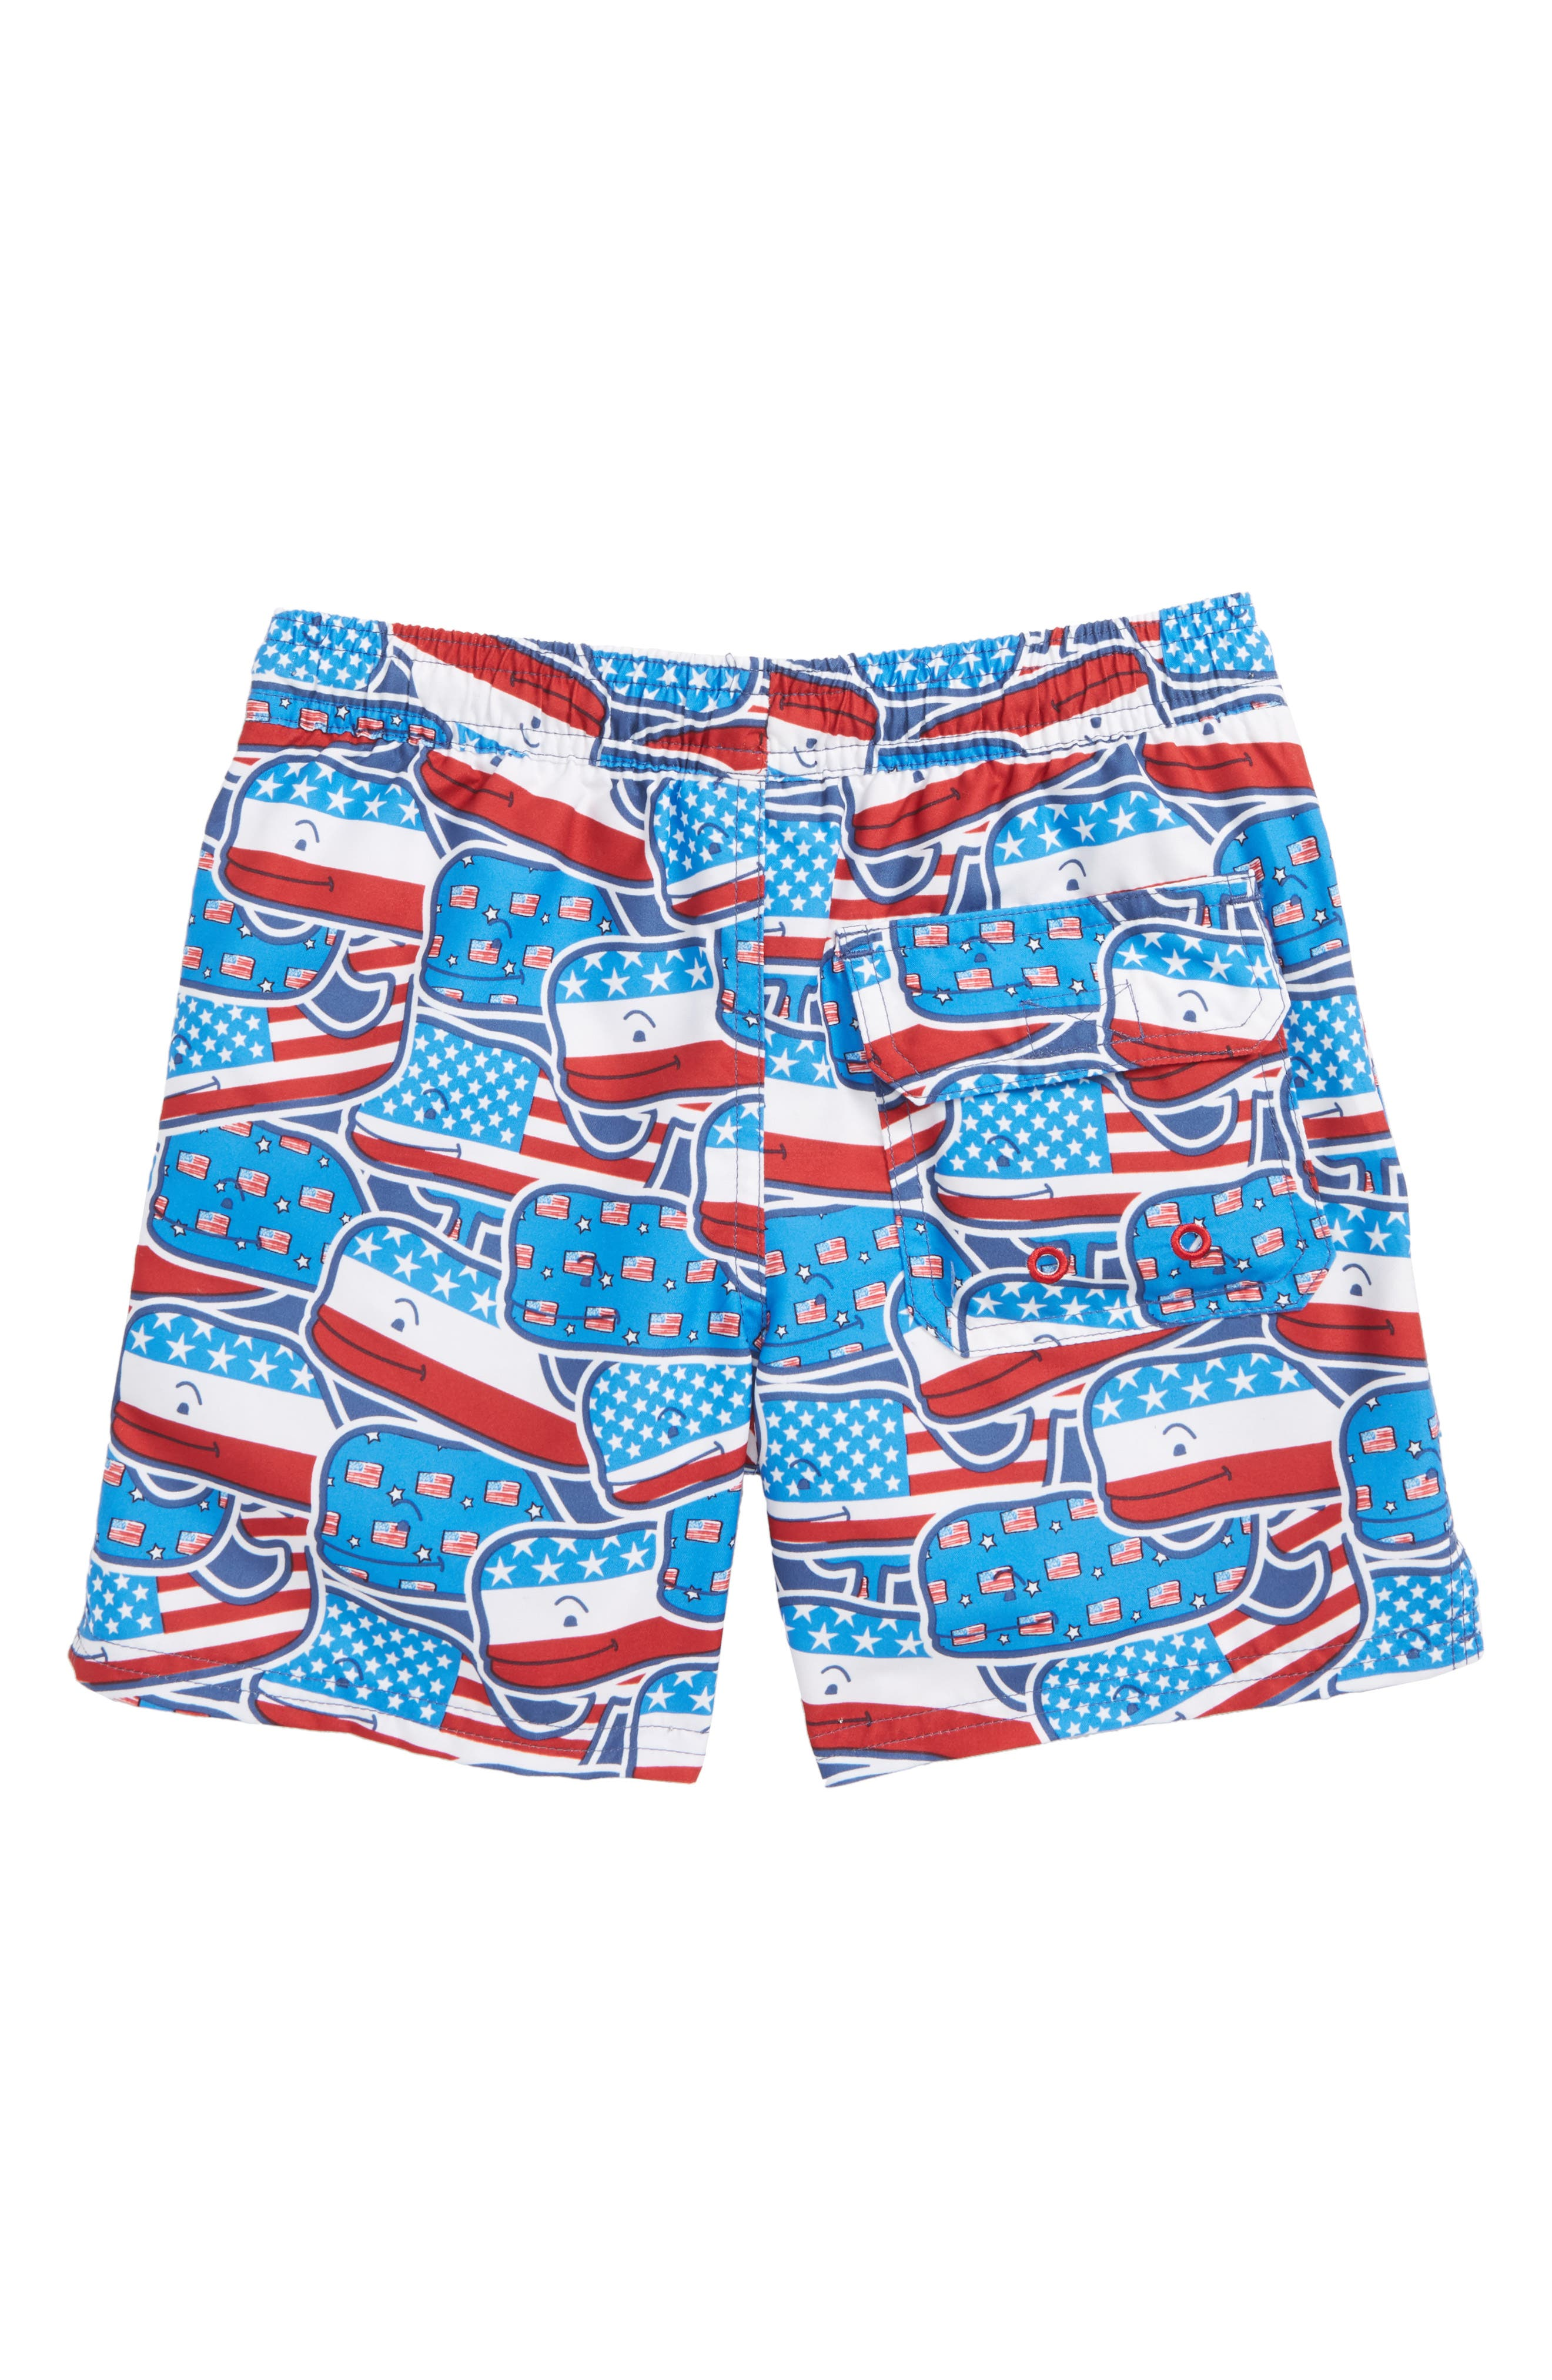 Chappy Whaley USA Swim Trunks,                             Alternate thumbnail 3, color,                             Moonshine